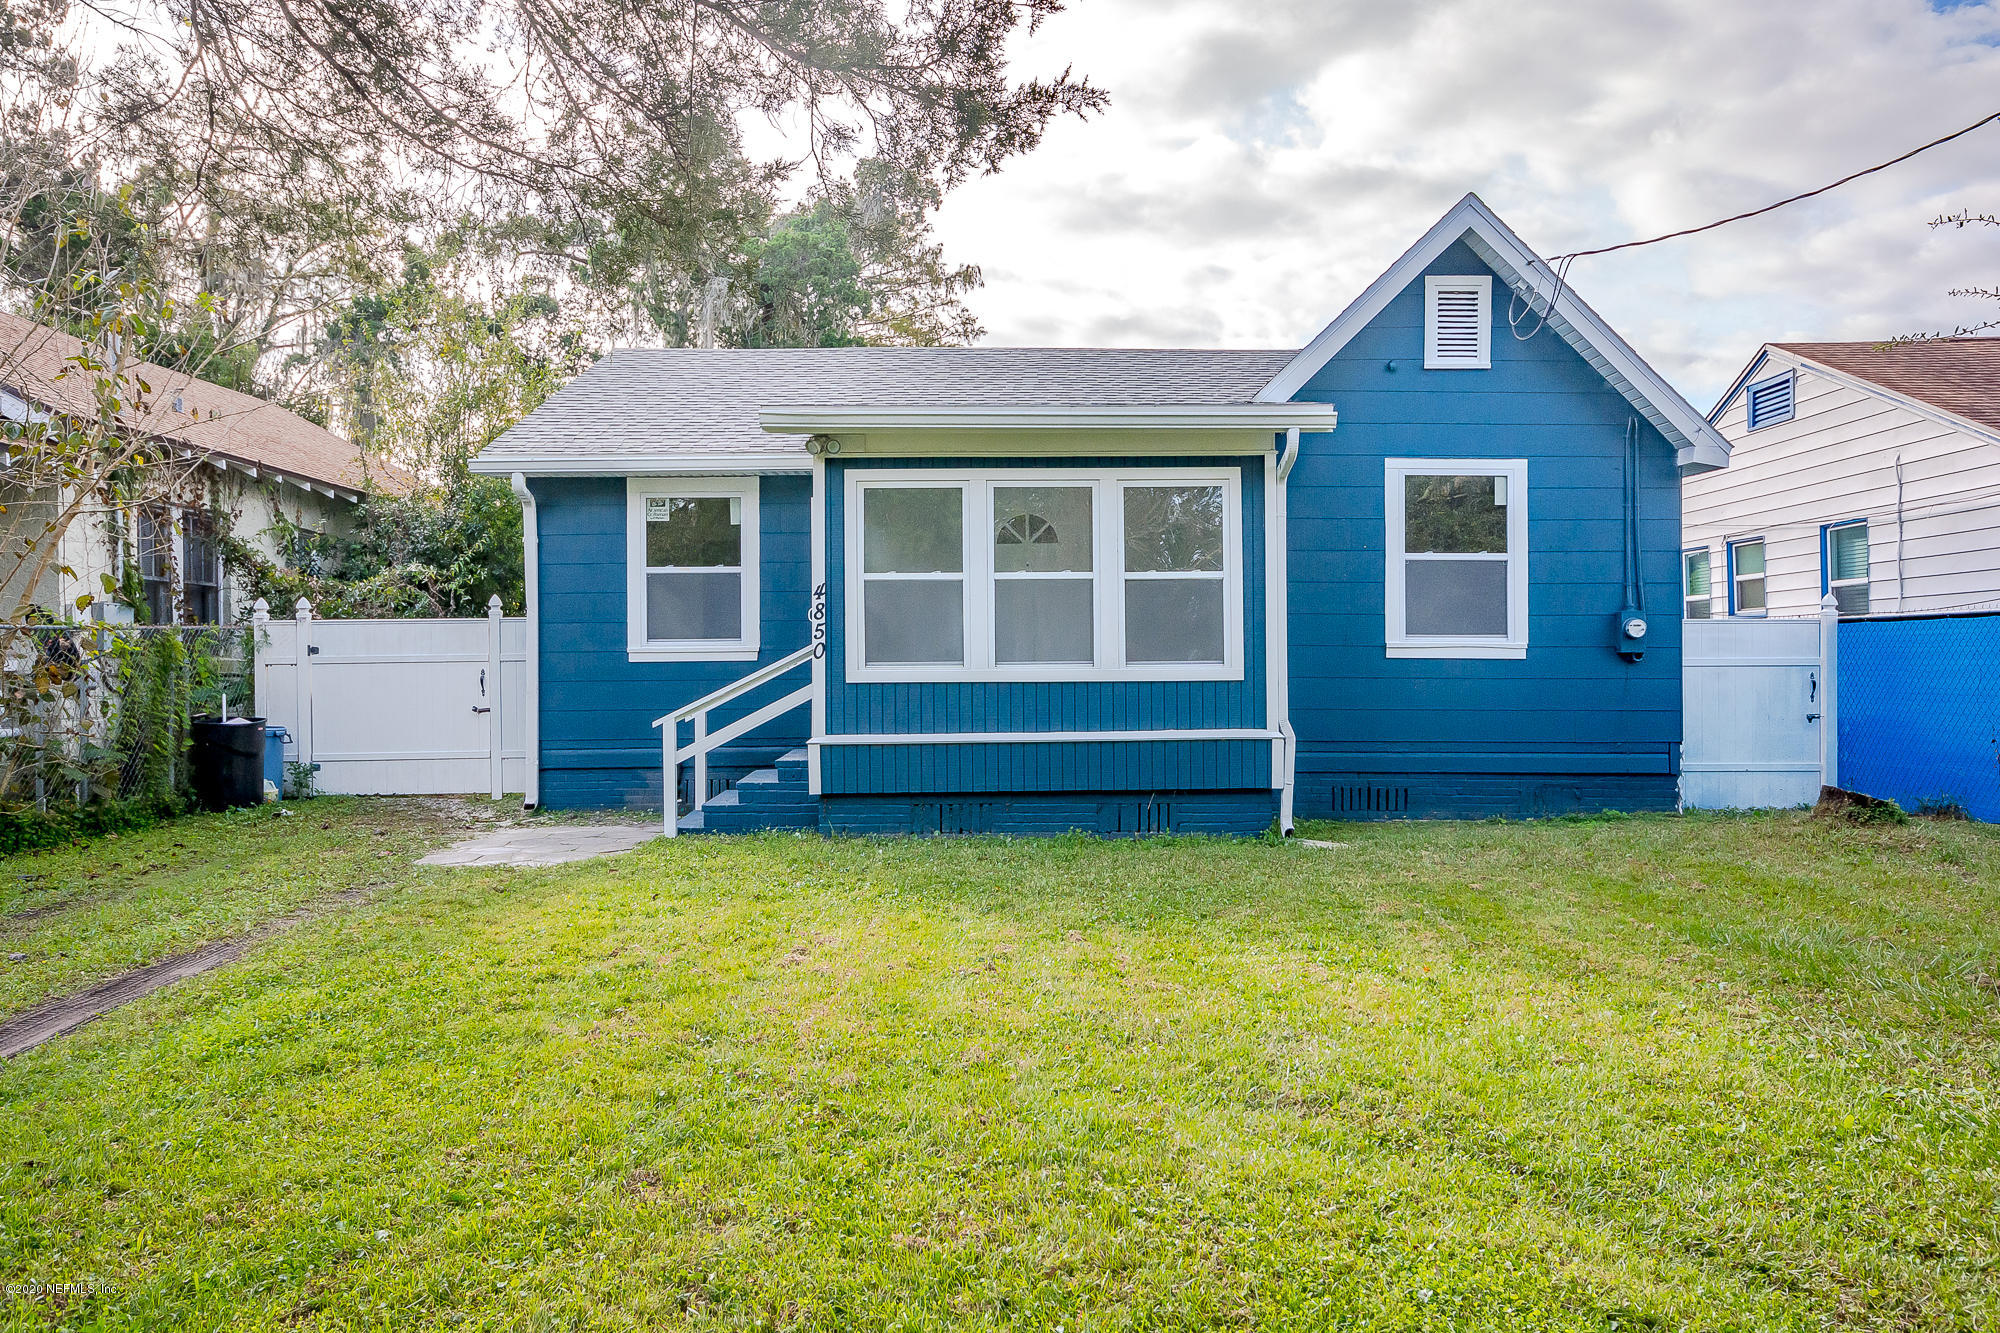 4850 SUNDERLAND, JACKSONVILLE, FLORIDA 32210, ,Commercial,For sale,SUNDERLAND,1085487